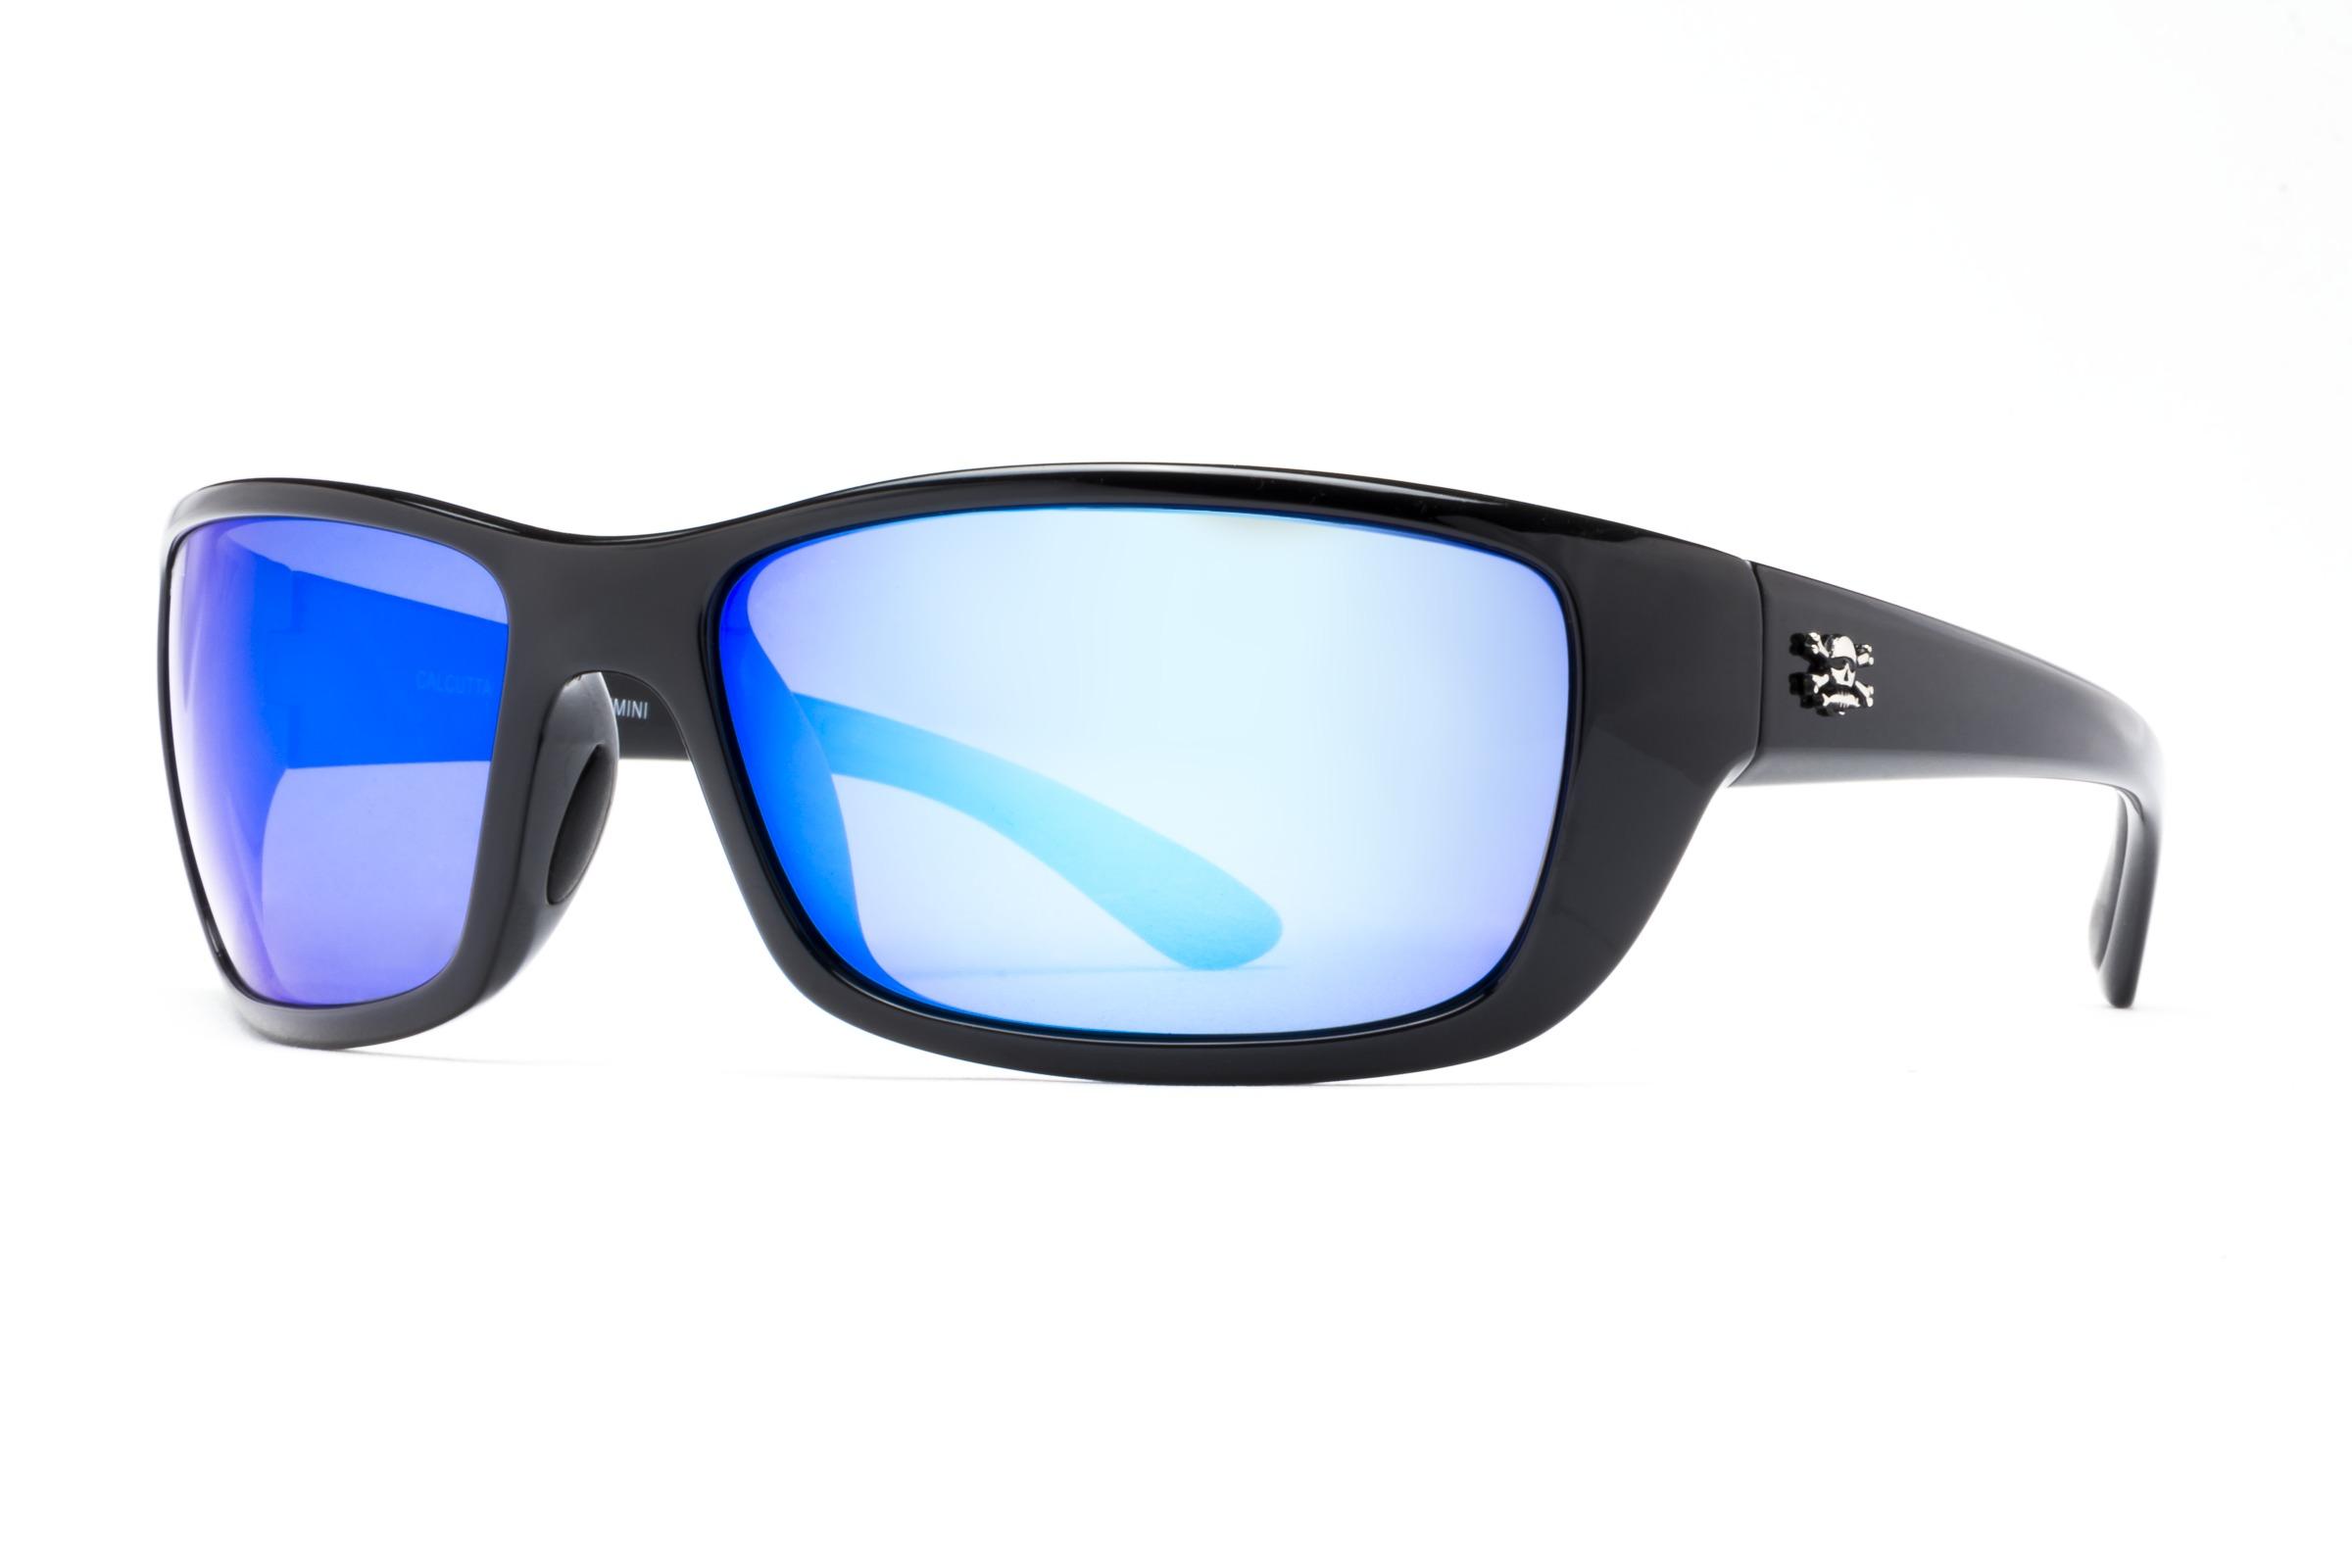 Calcutta BN1BM Bimini Sunglasses Black Frame/Blue Mirror Lens 64mm